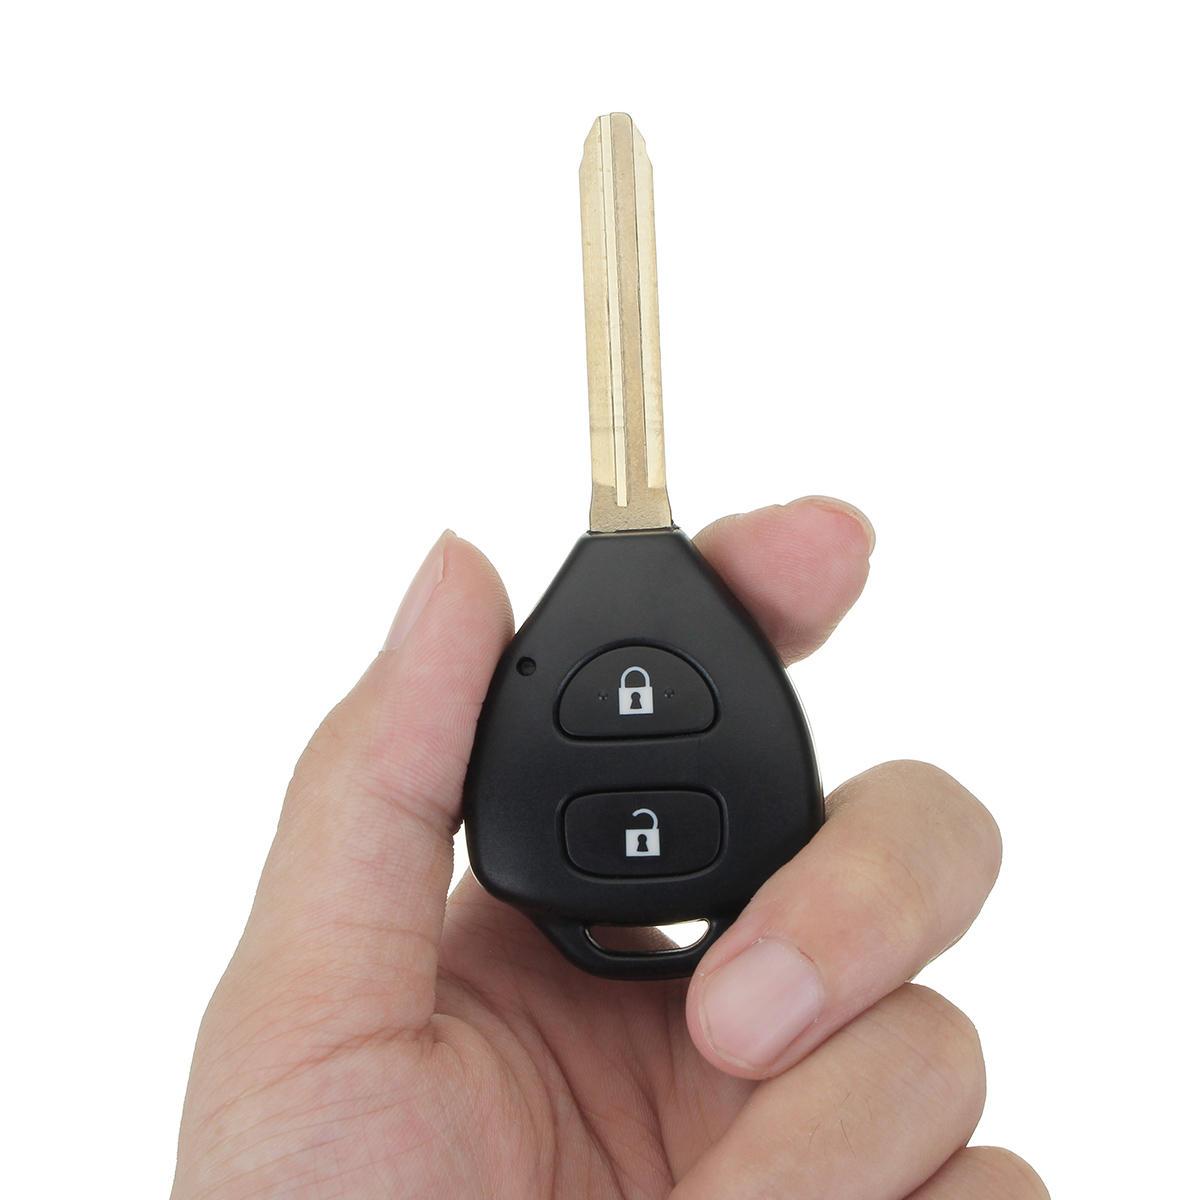 433 MHz 4D Coche Control remoto clave clave completa con chips para Toyota Hilux 2004-2009